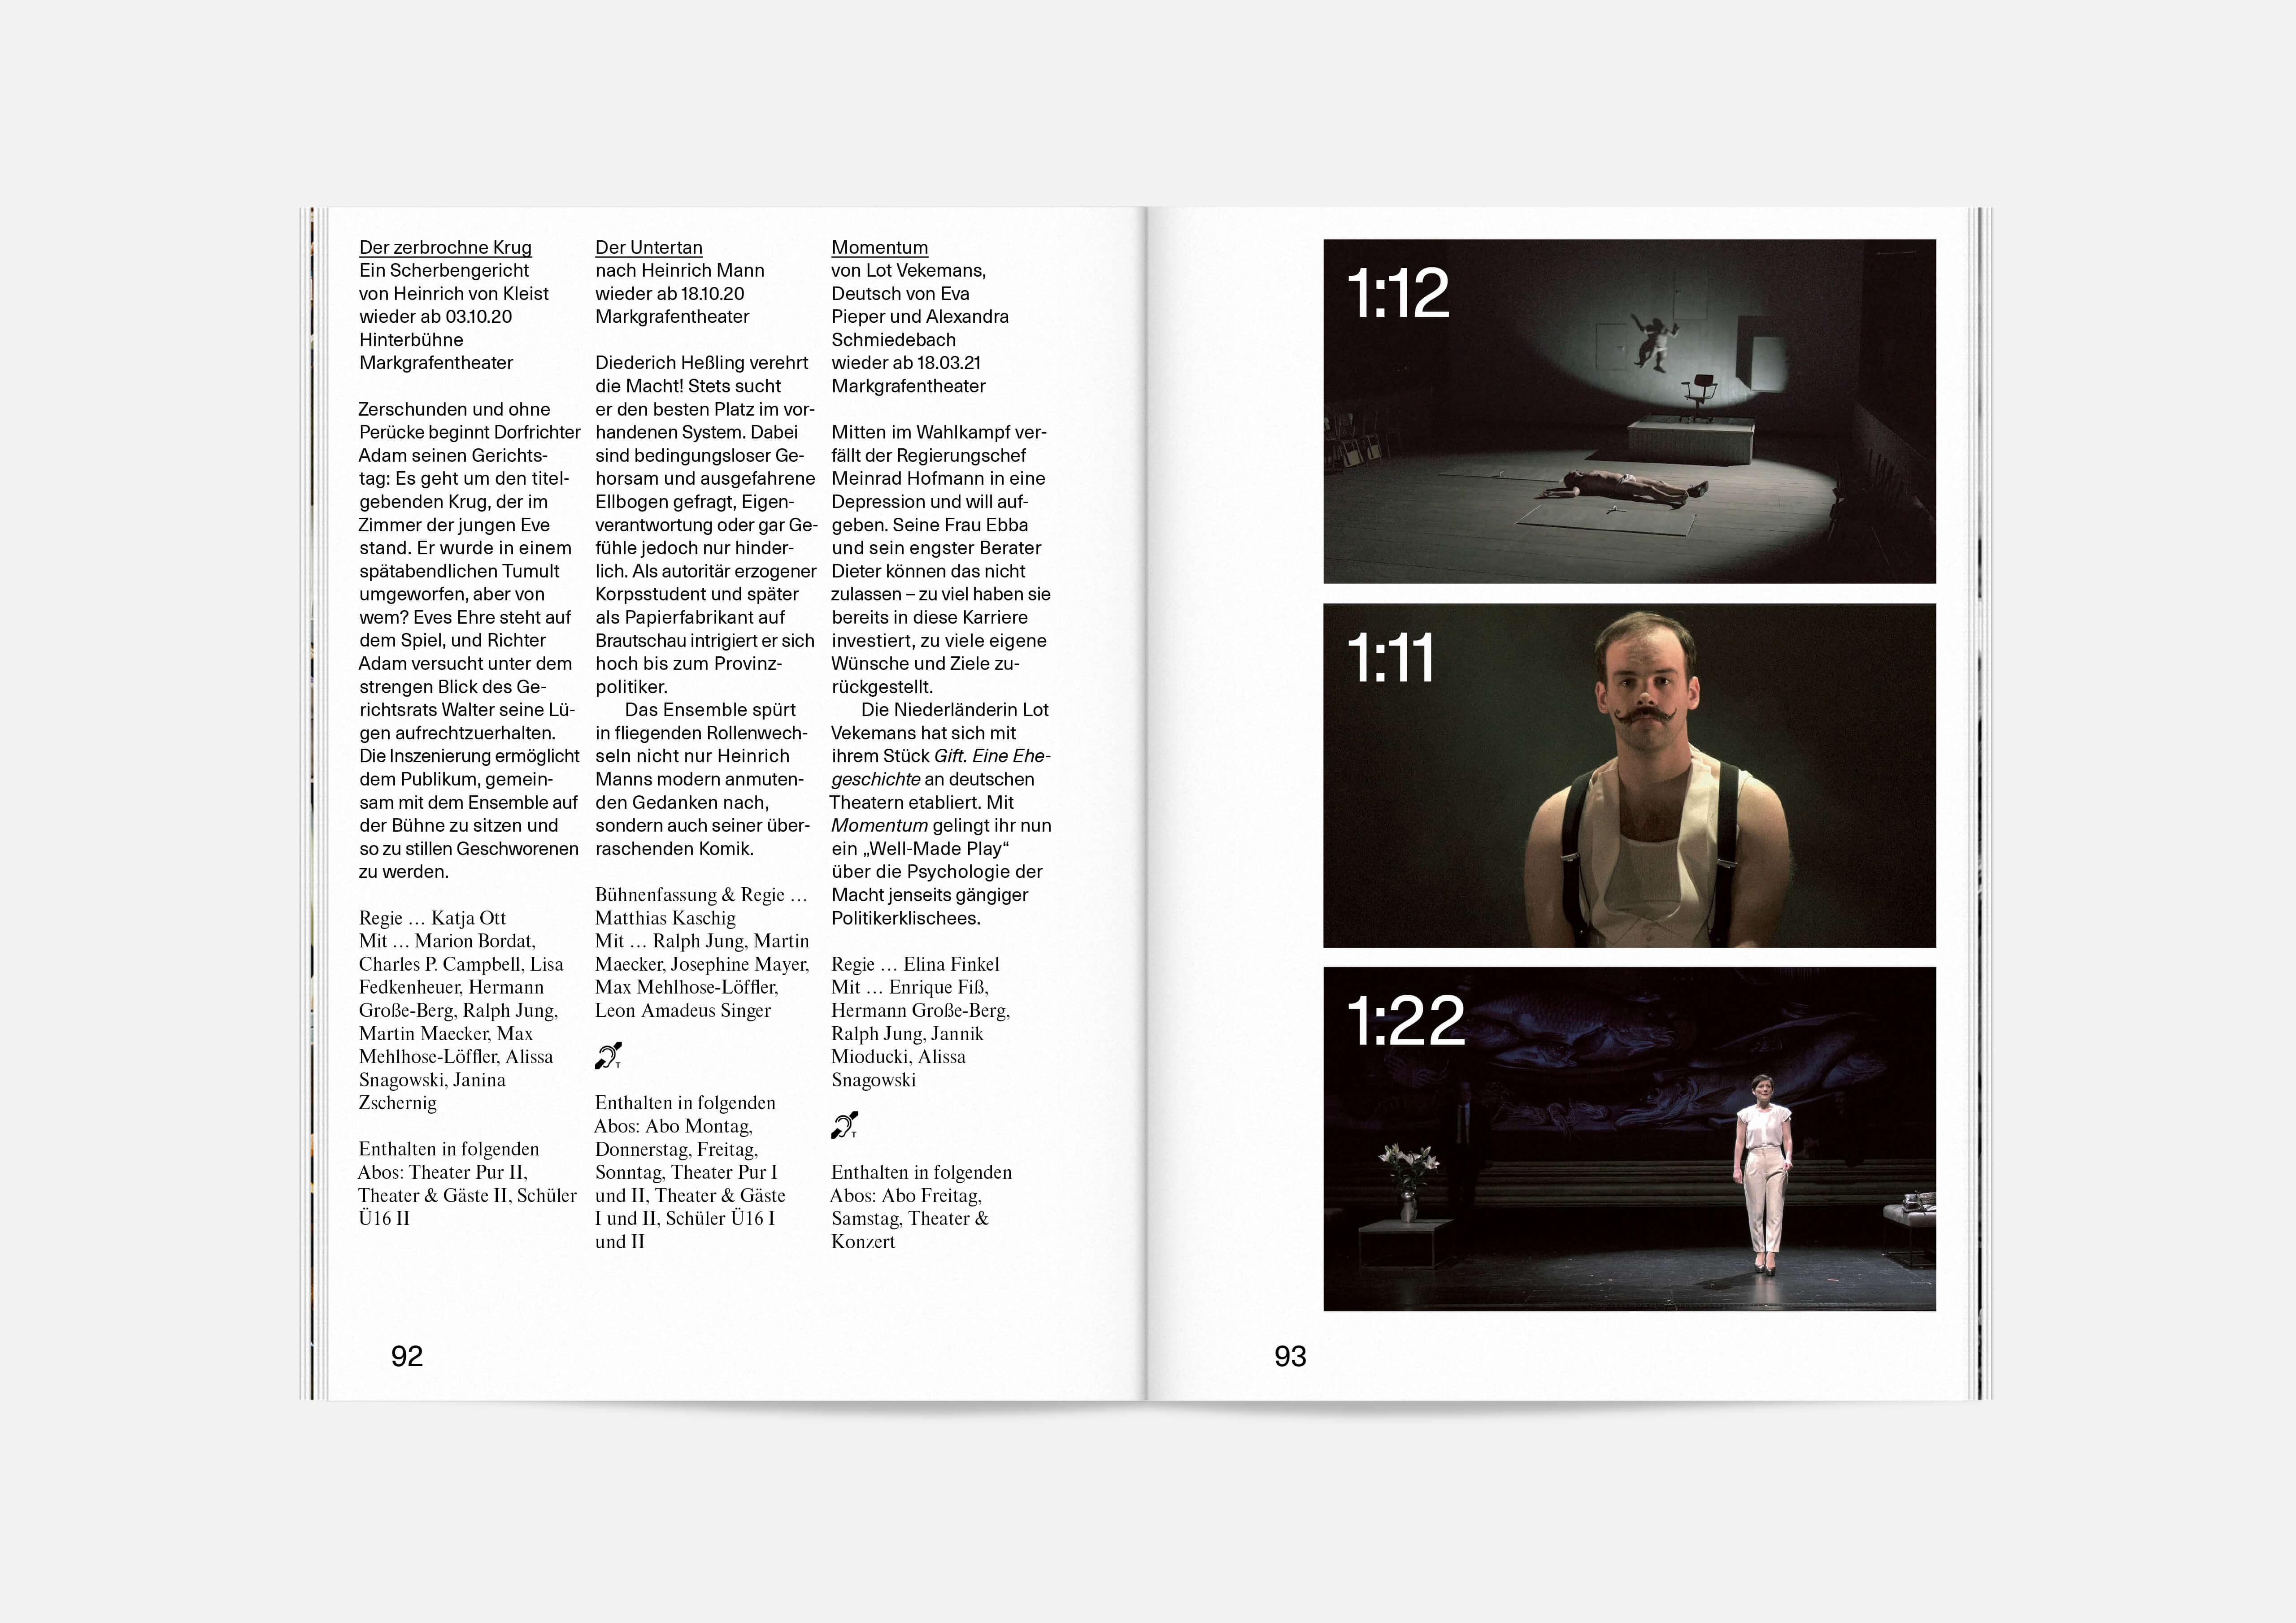 https://neuegestaltung.de/media/pages/clients/theater-erlangen-season-program-20-21/d7af6c1190-1606409631/27_te-spielzeitheft2021.jpg